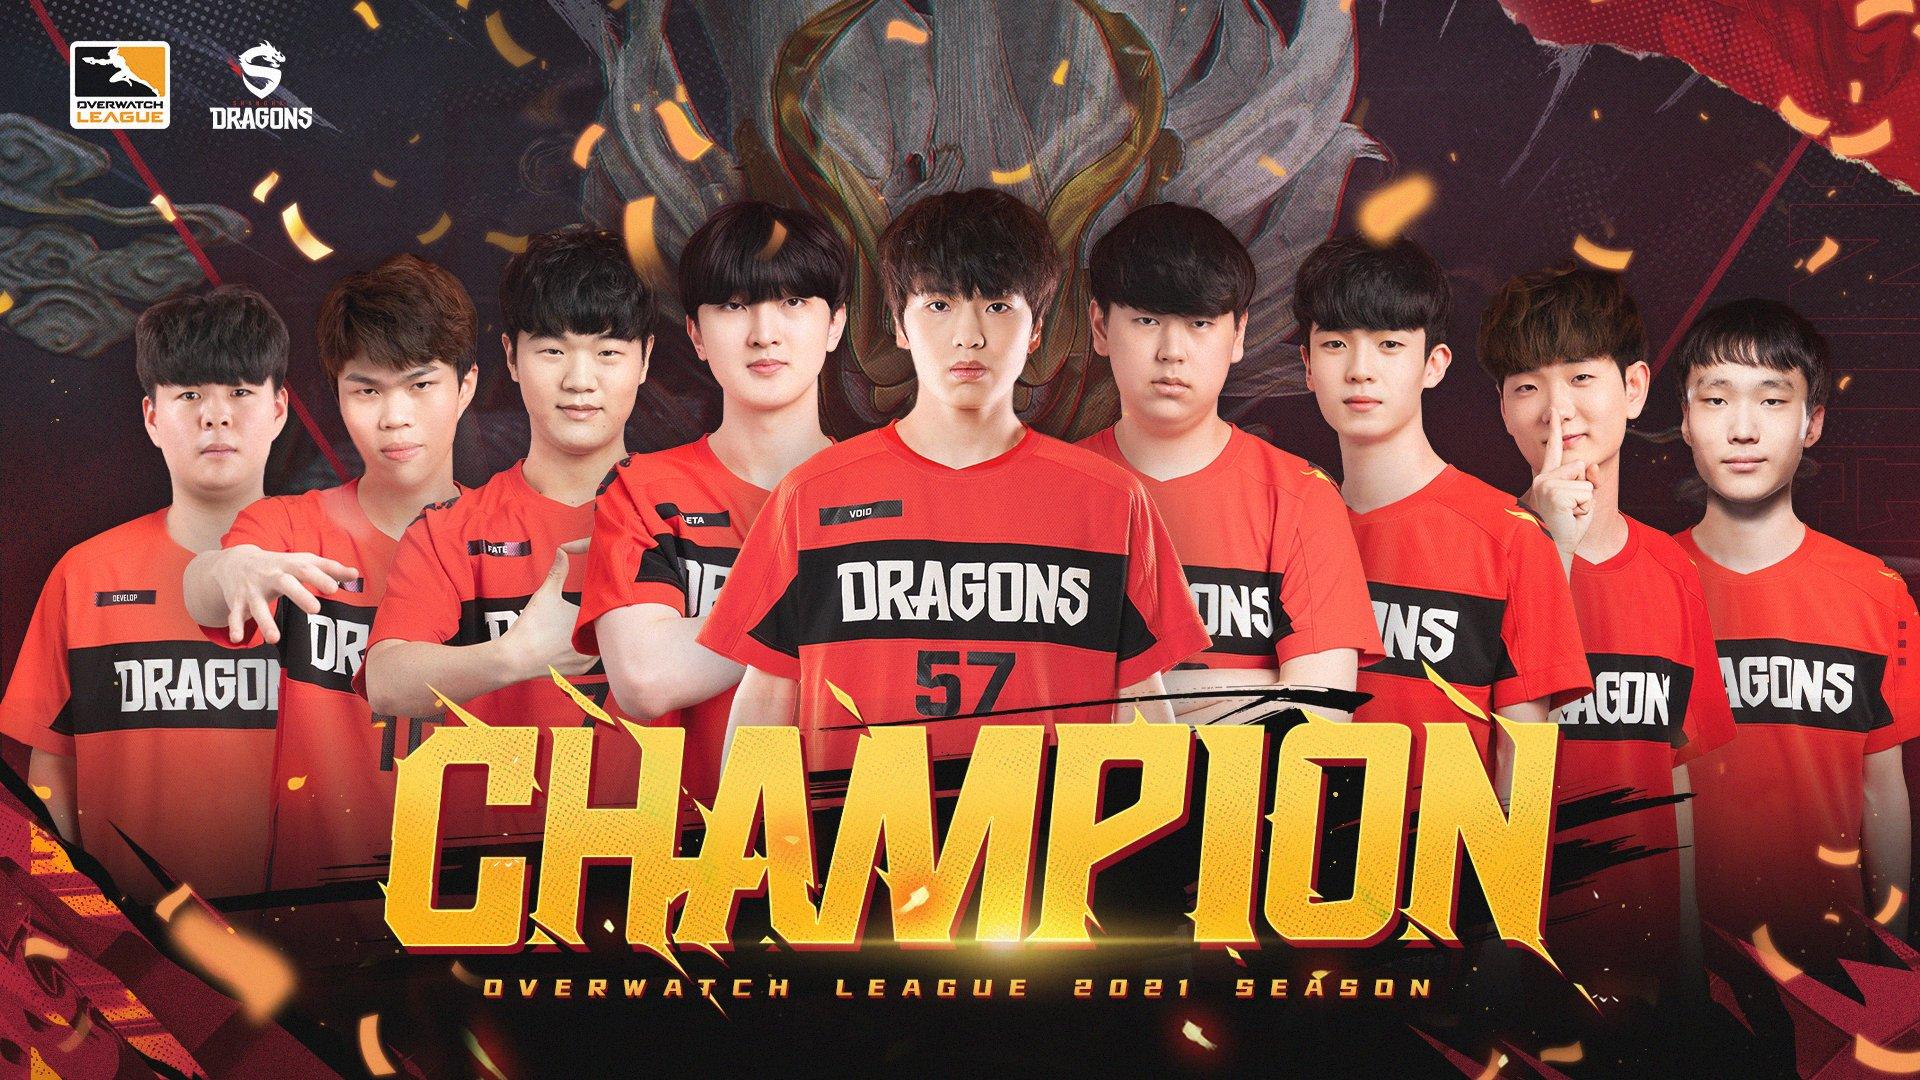 shanghai dragons champions overwatch league 2021